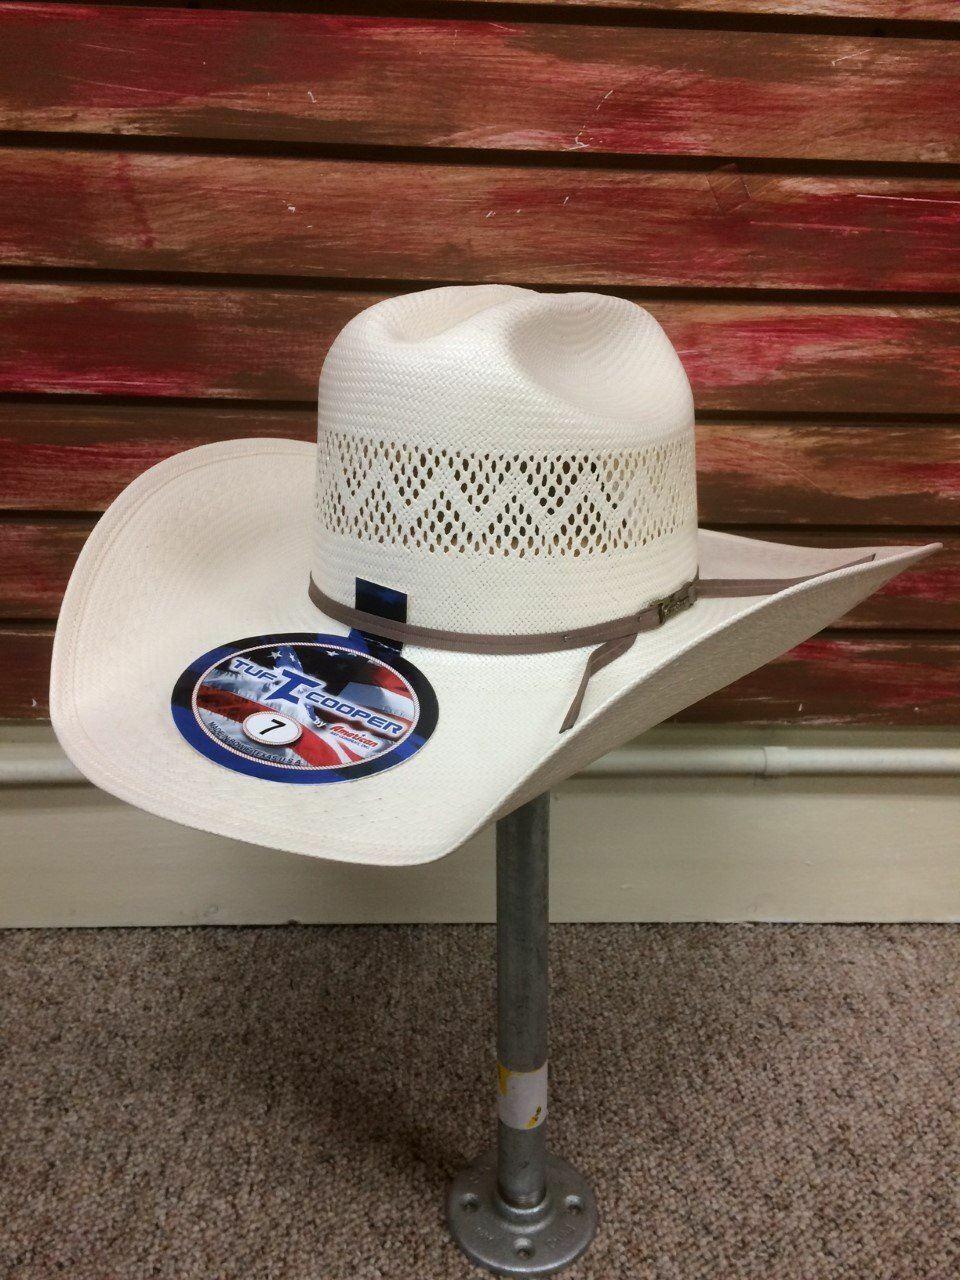 American Hat Tuf Cooper Rancher Straw Cowboy  Hat TC8890  comfortable